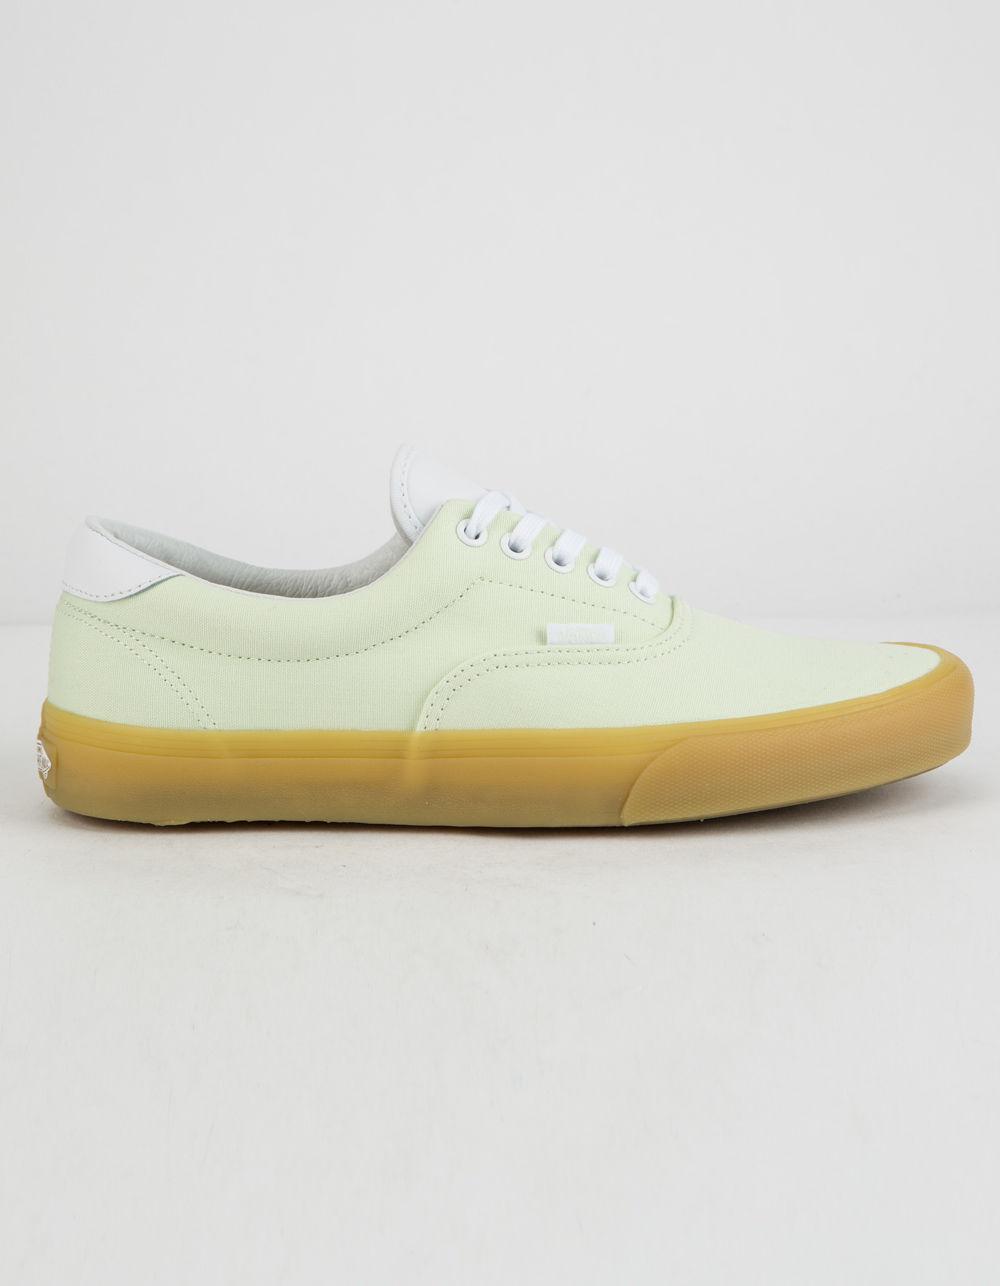 e6bbce668063f4 Lyst - Vans Double Light Gum Era 59 Shoes in Green for Men